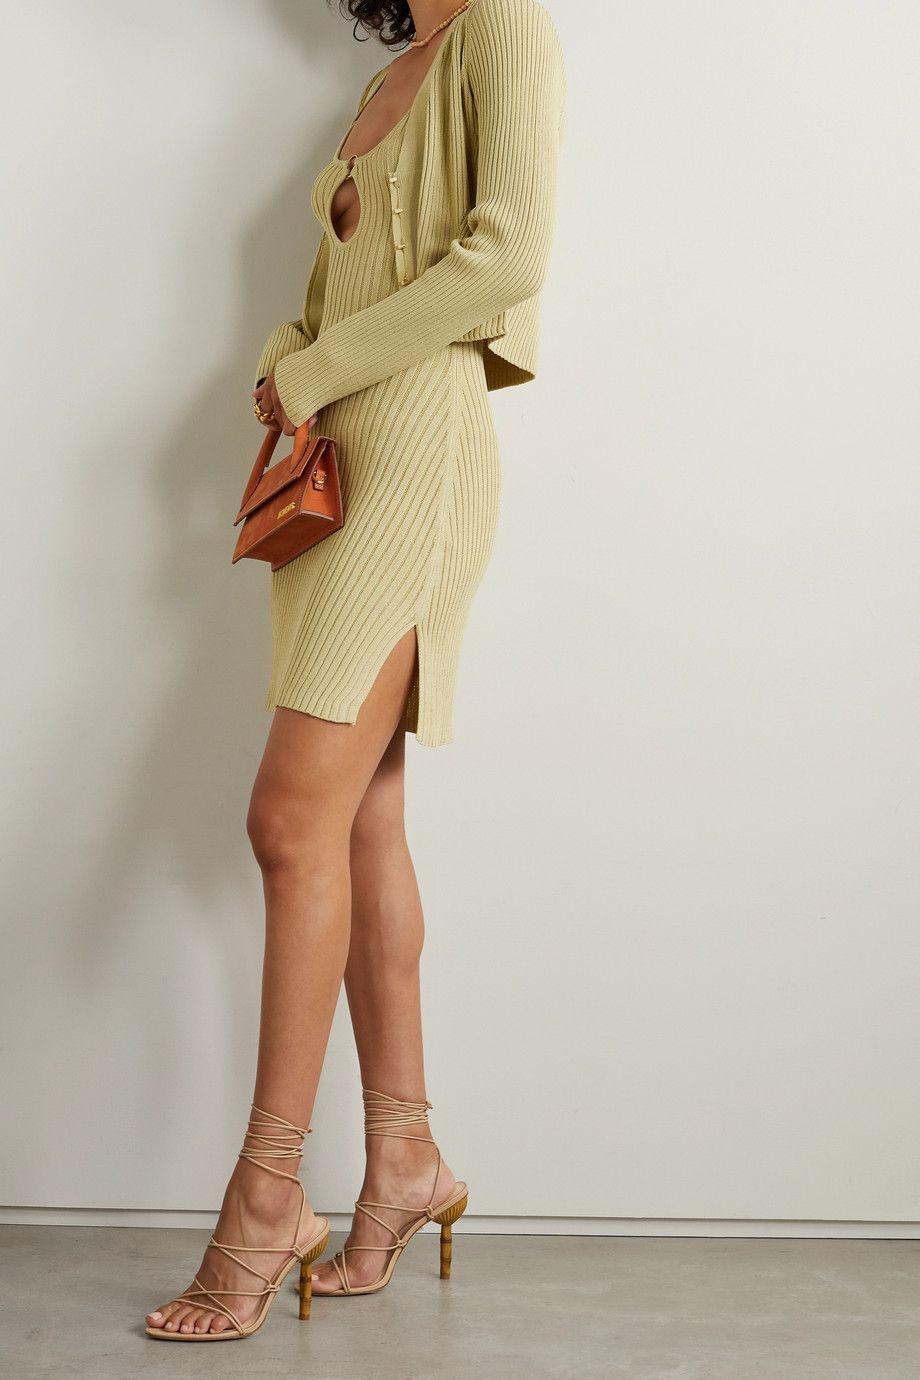 best new fashion items 286246 1629960965555